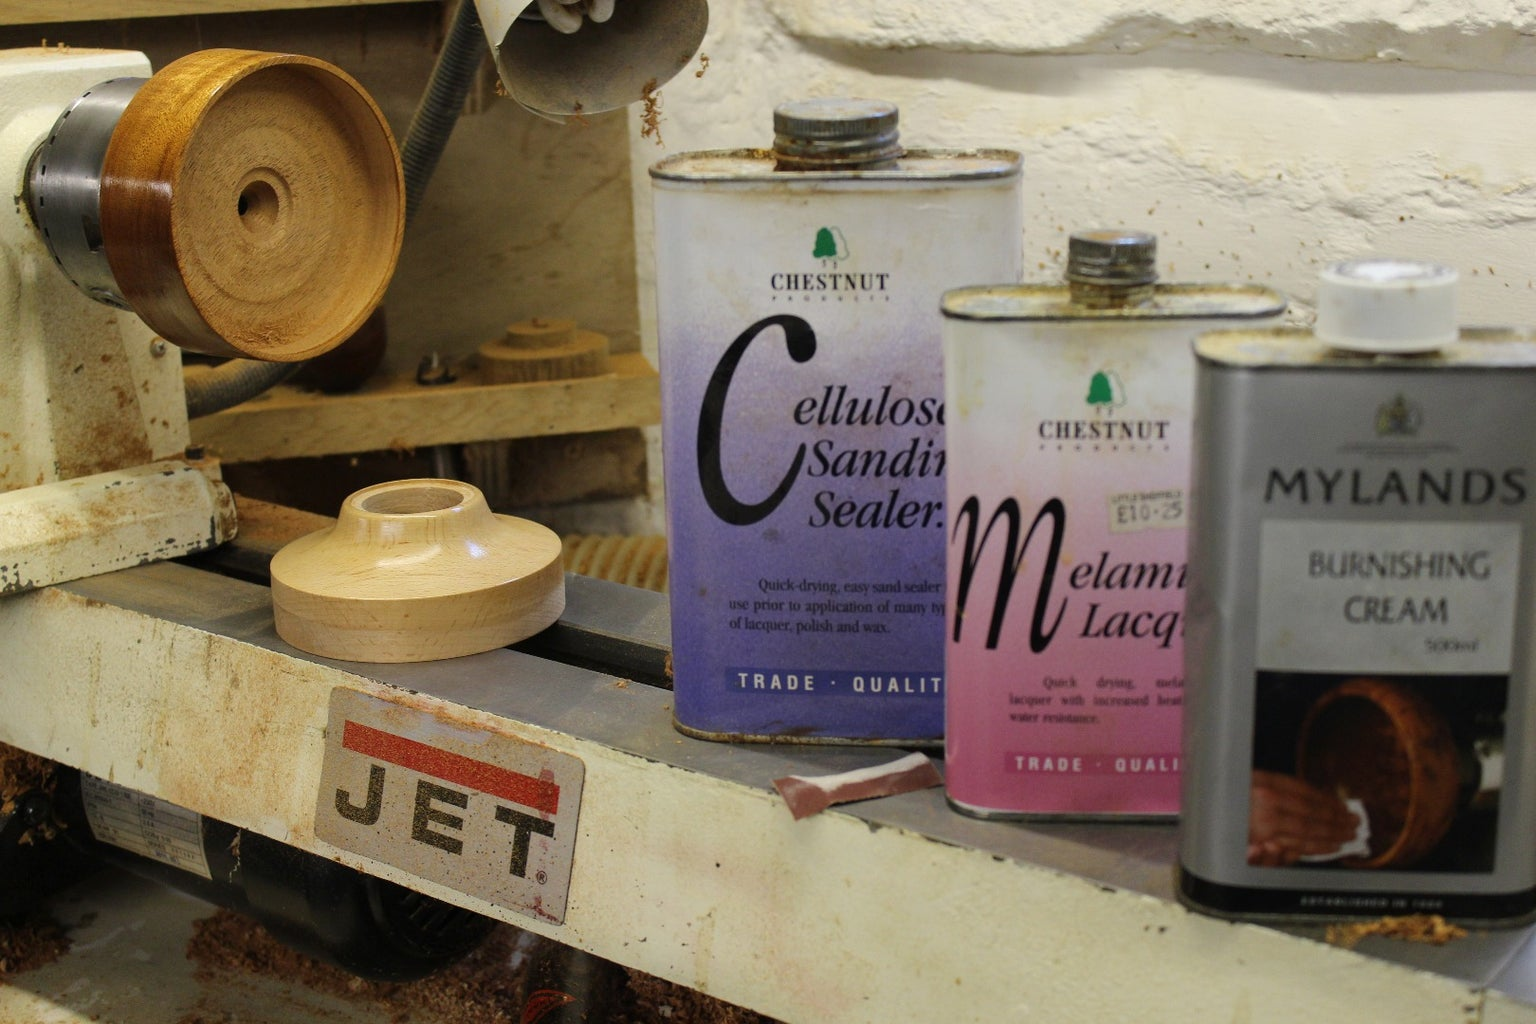 Finnish Glue and Carve Off That Ugly Spiggot